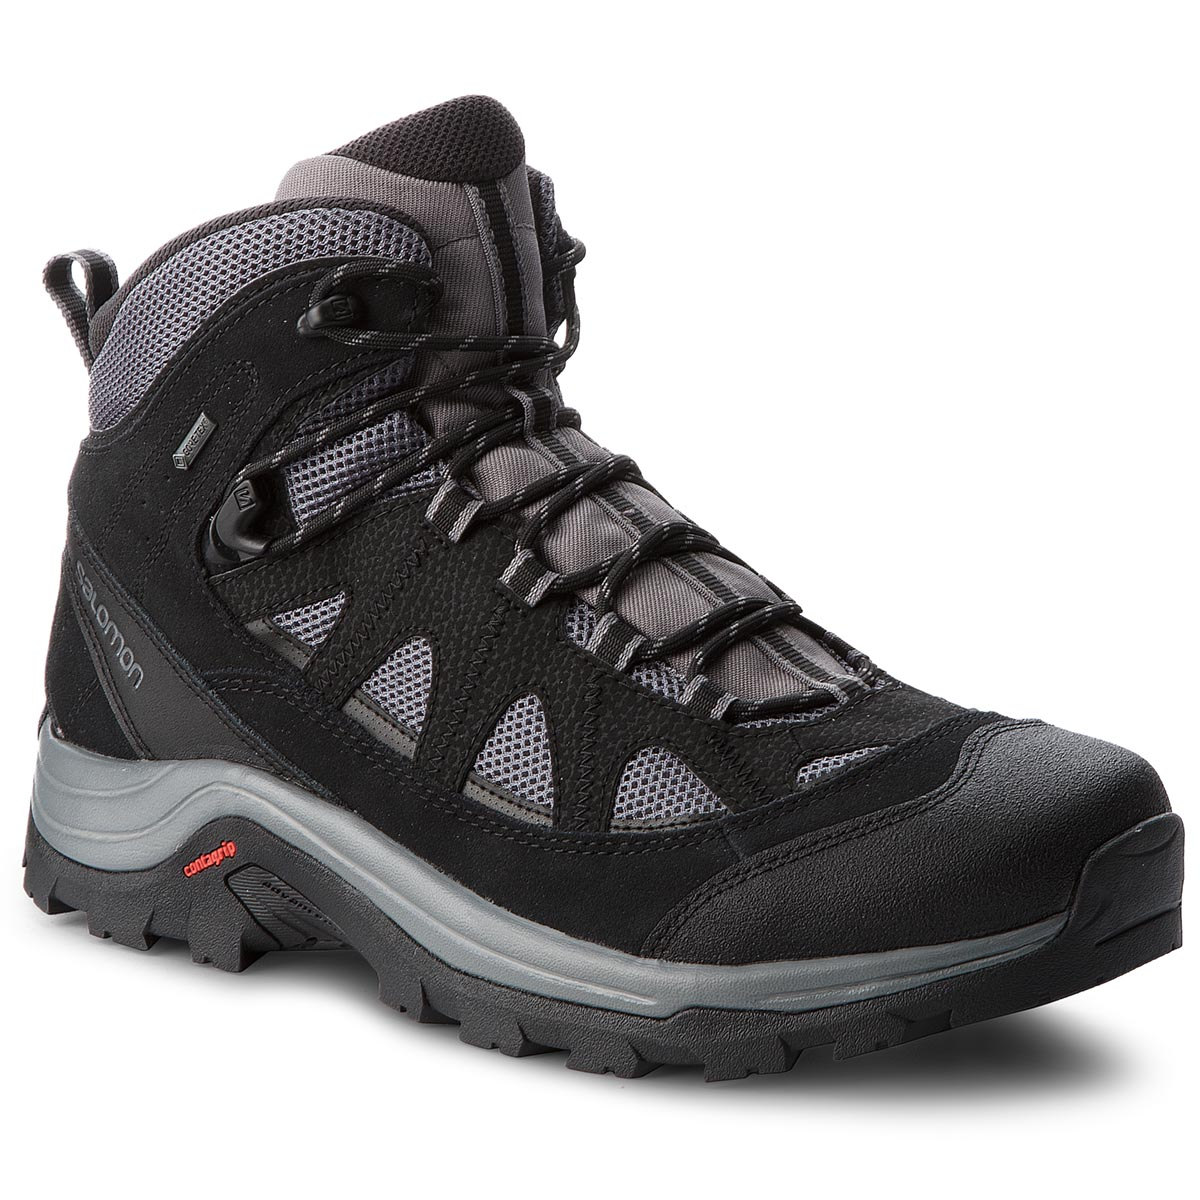 new product 952d6 877d2 Trekker Boots SALOMON Authentic Ltr Gtx GORE-TEX 404643 33 V0  Magnet Black Quiet Shade